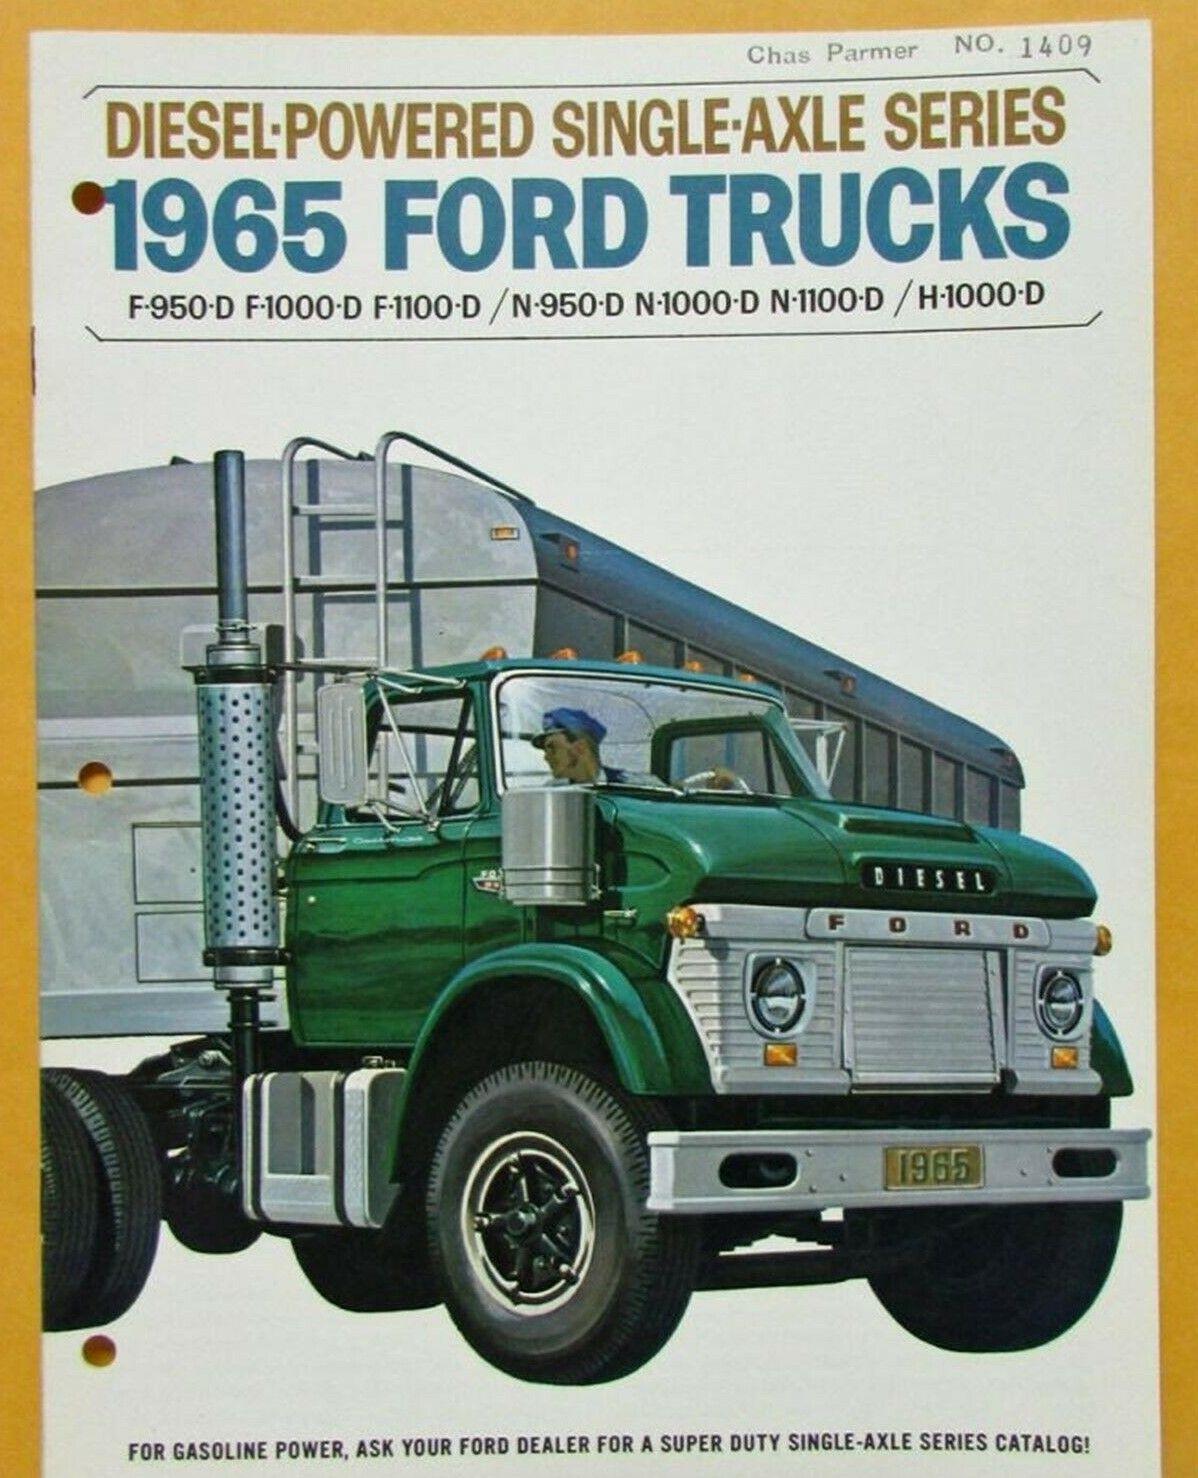 1965 Ford Truck Brochure In 2020 Trucks Ford Truck 1964 Ford